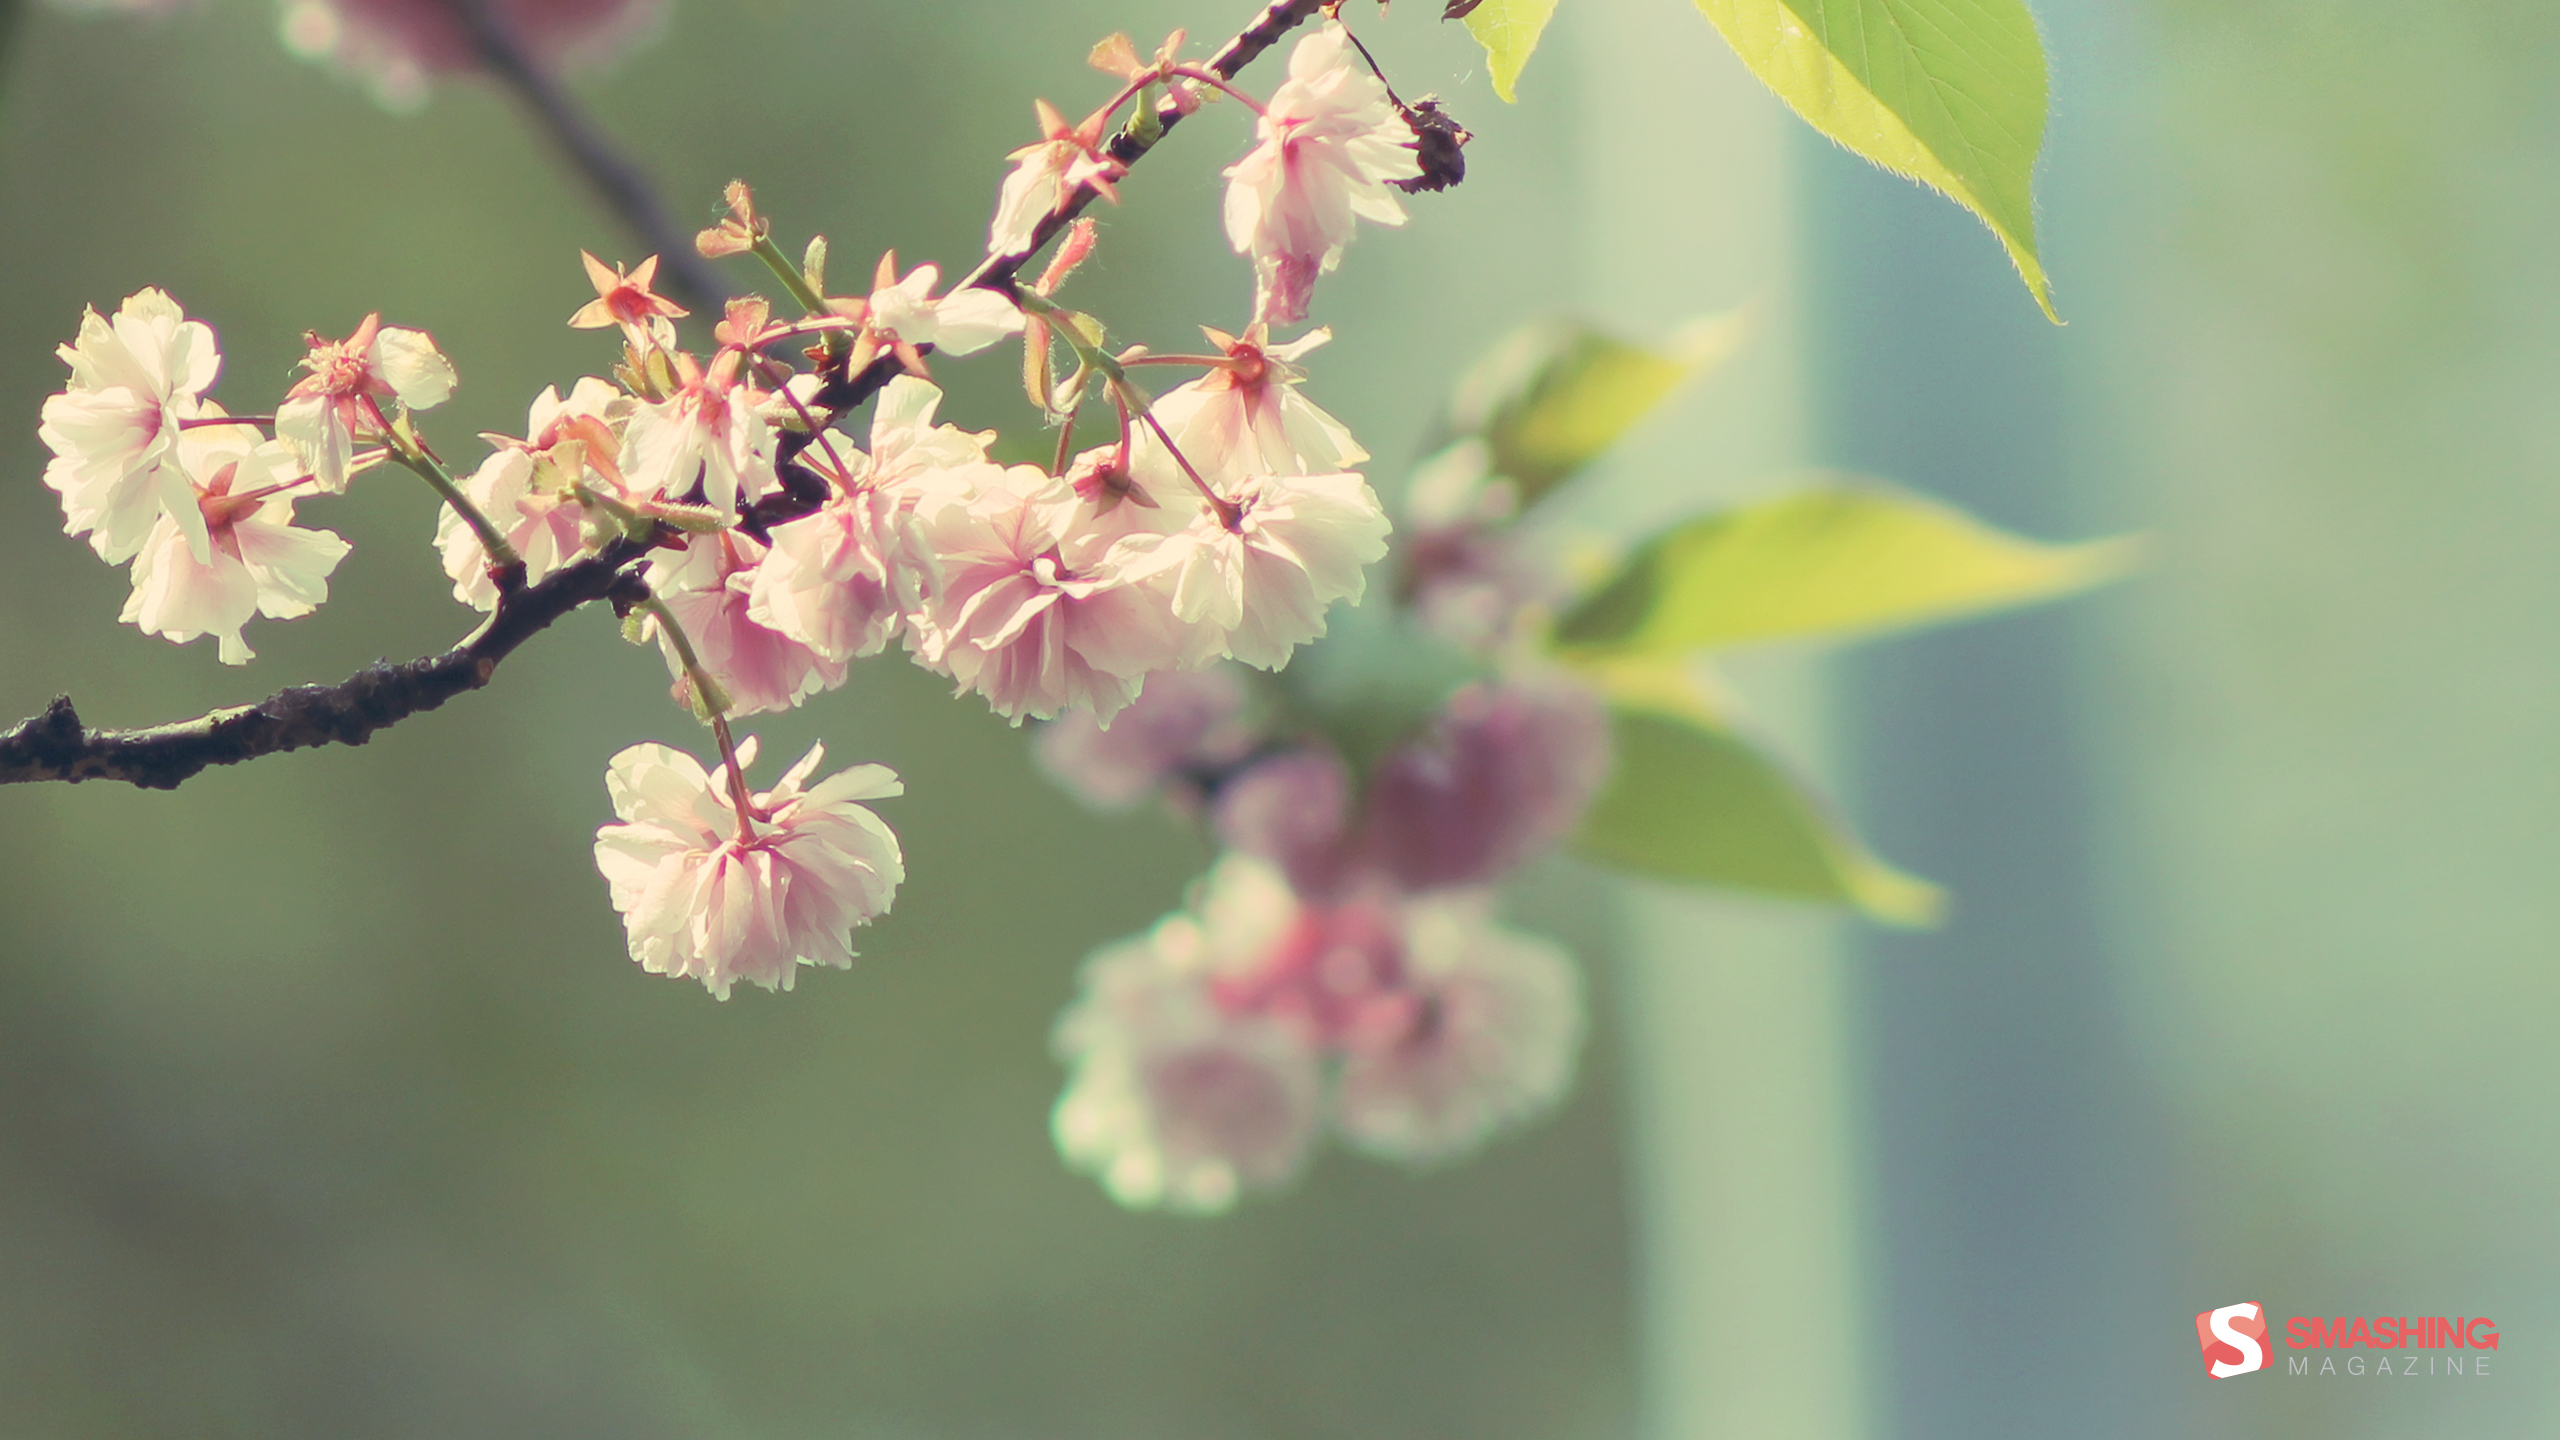 Desktop Wallpaper Calendar: May 2013 | Ruturaj Pradeep Kohok | Your ...